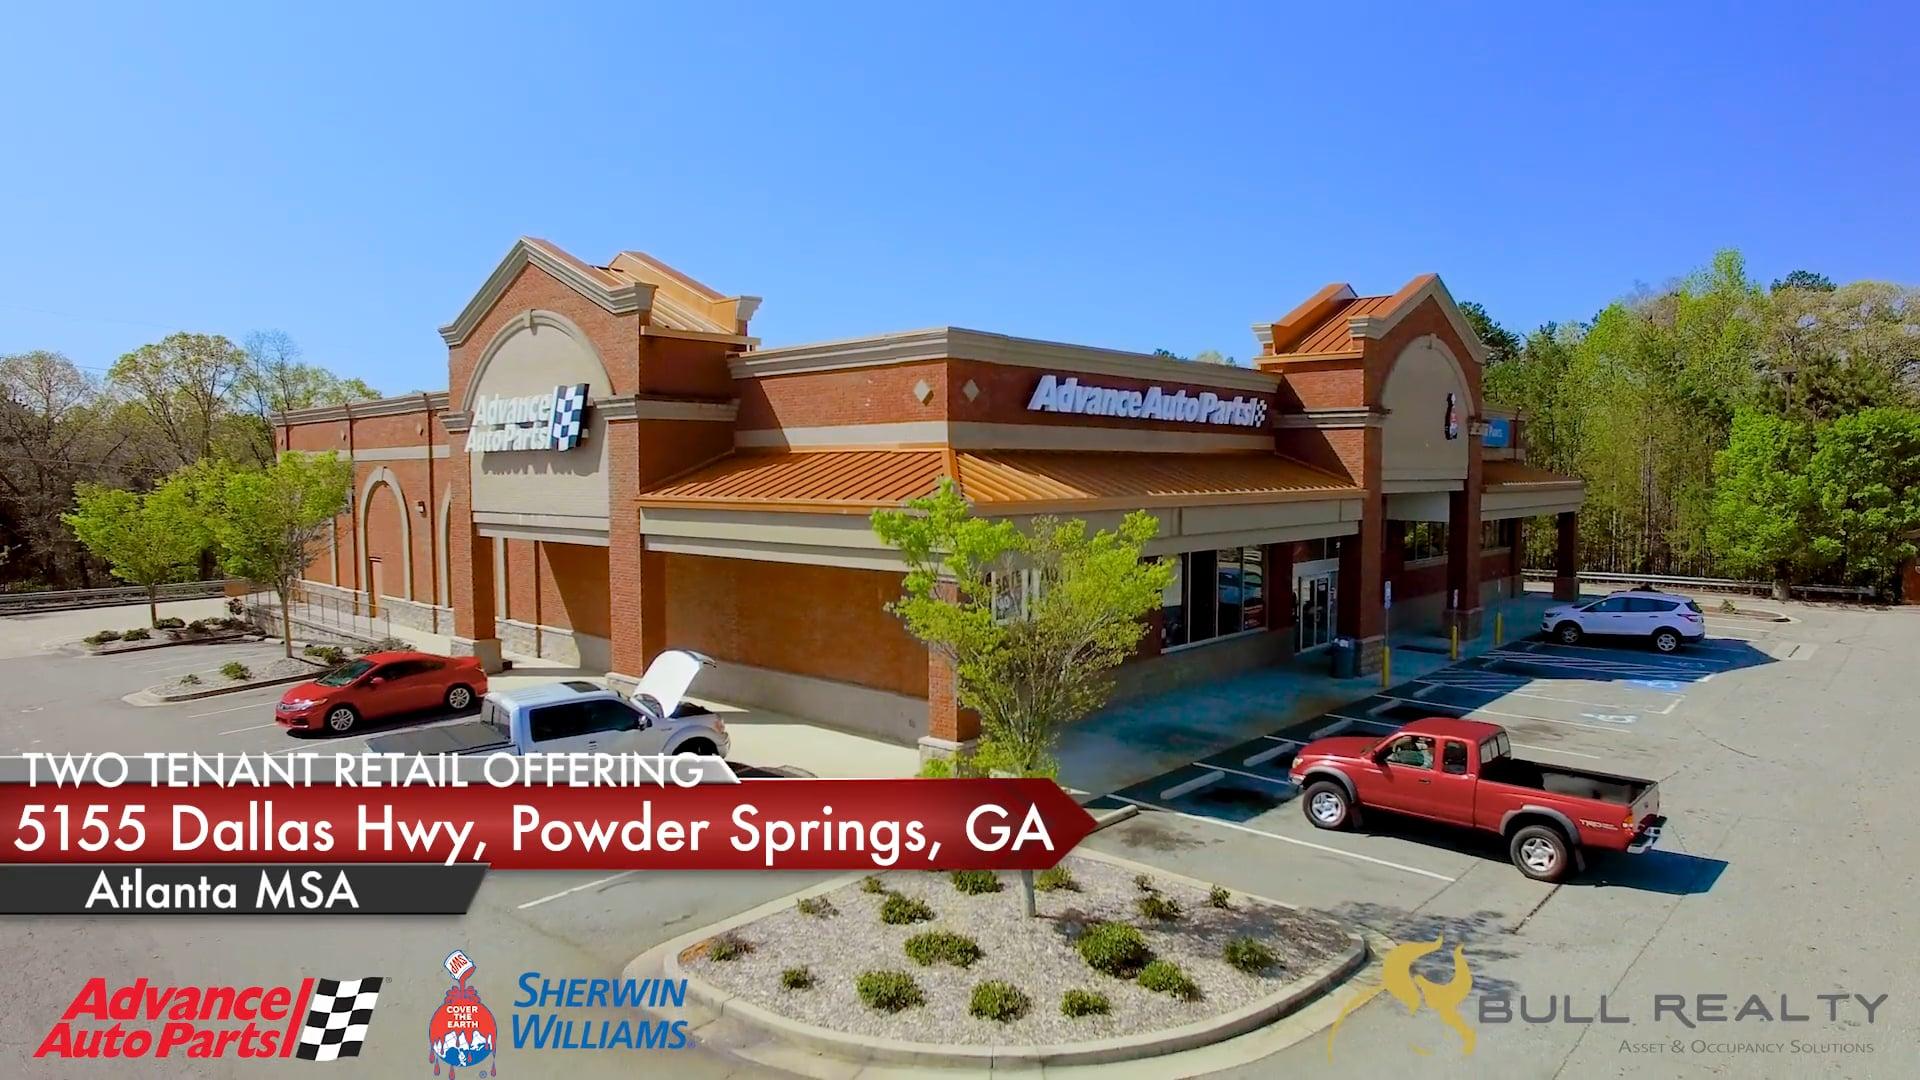 5155 Dallas Hwy, Powder Springs, GA 30127 - Bull Realty